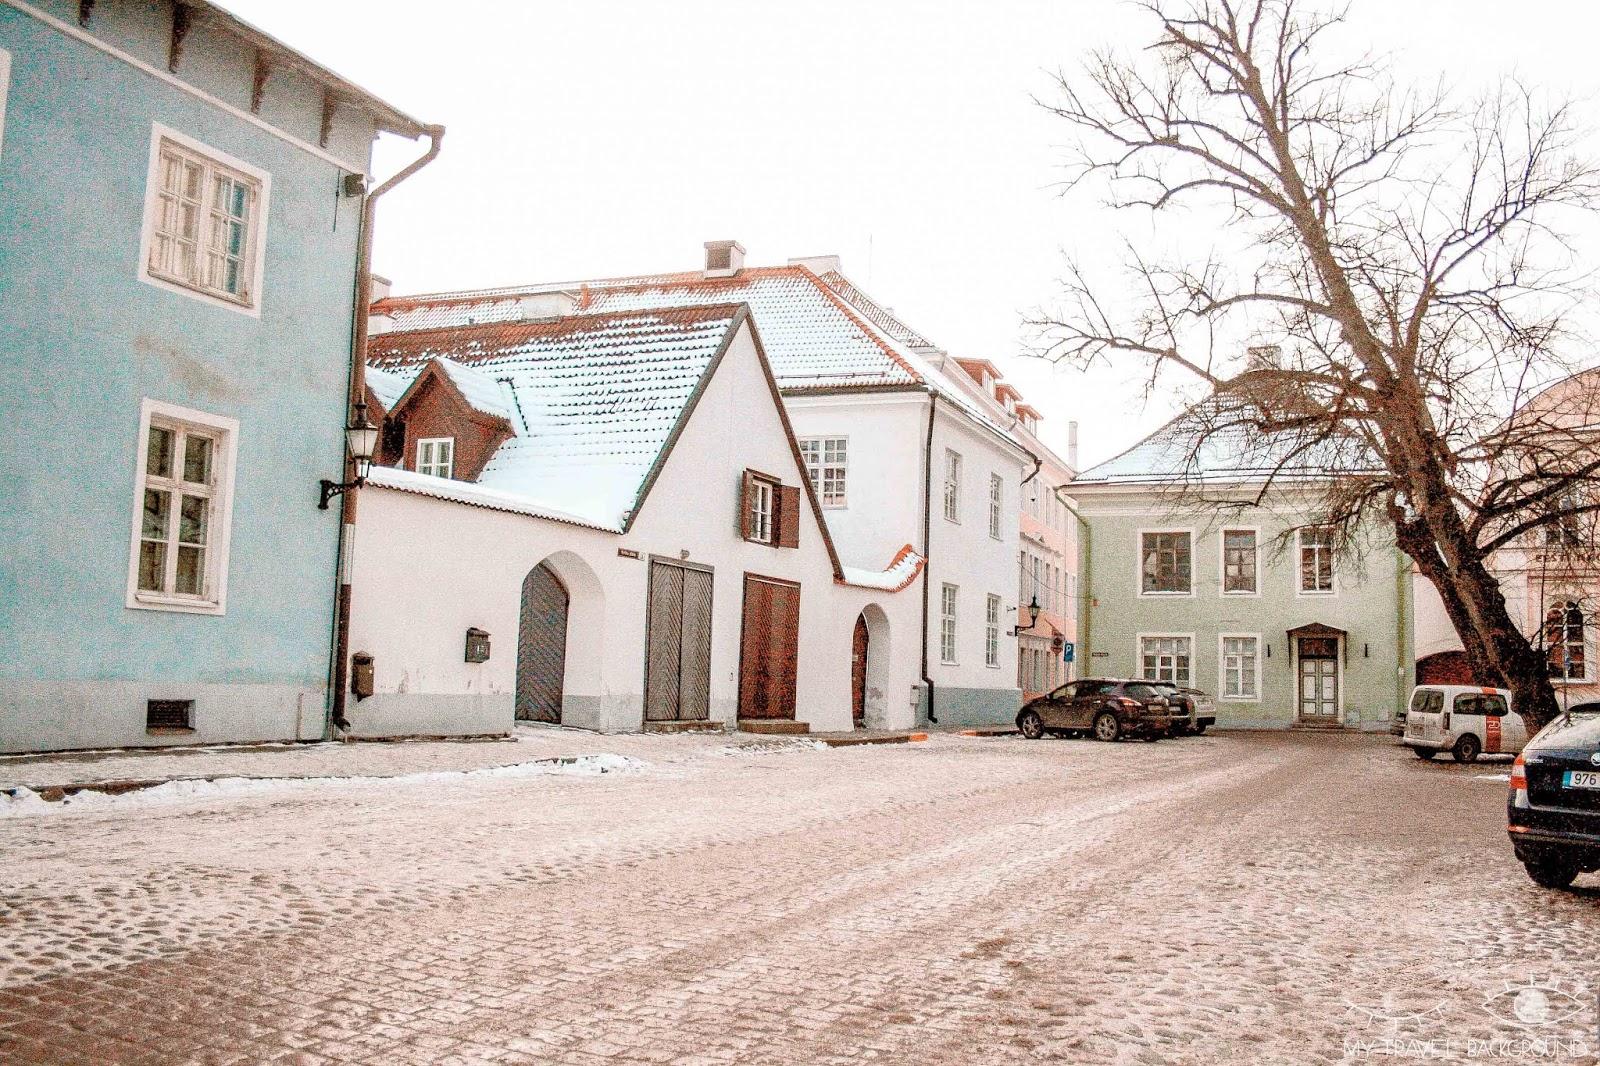 My Travel Background : Escale à Tallinn en Estonie, la perle de la Mer Baltique - Toompea